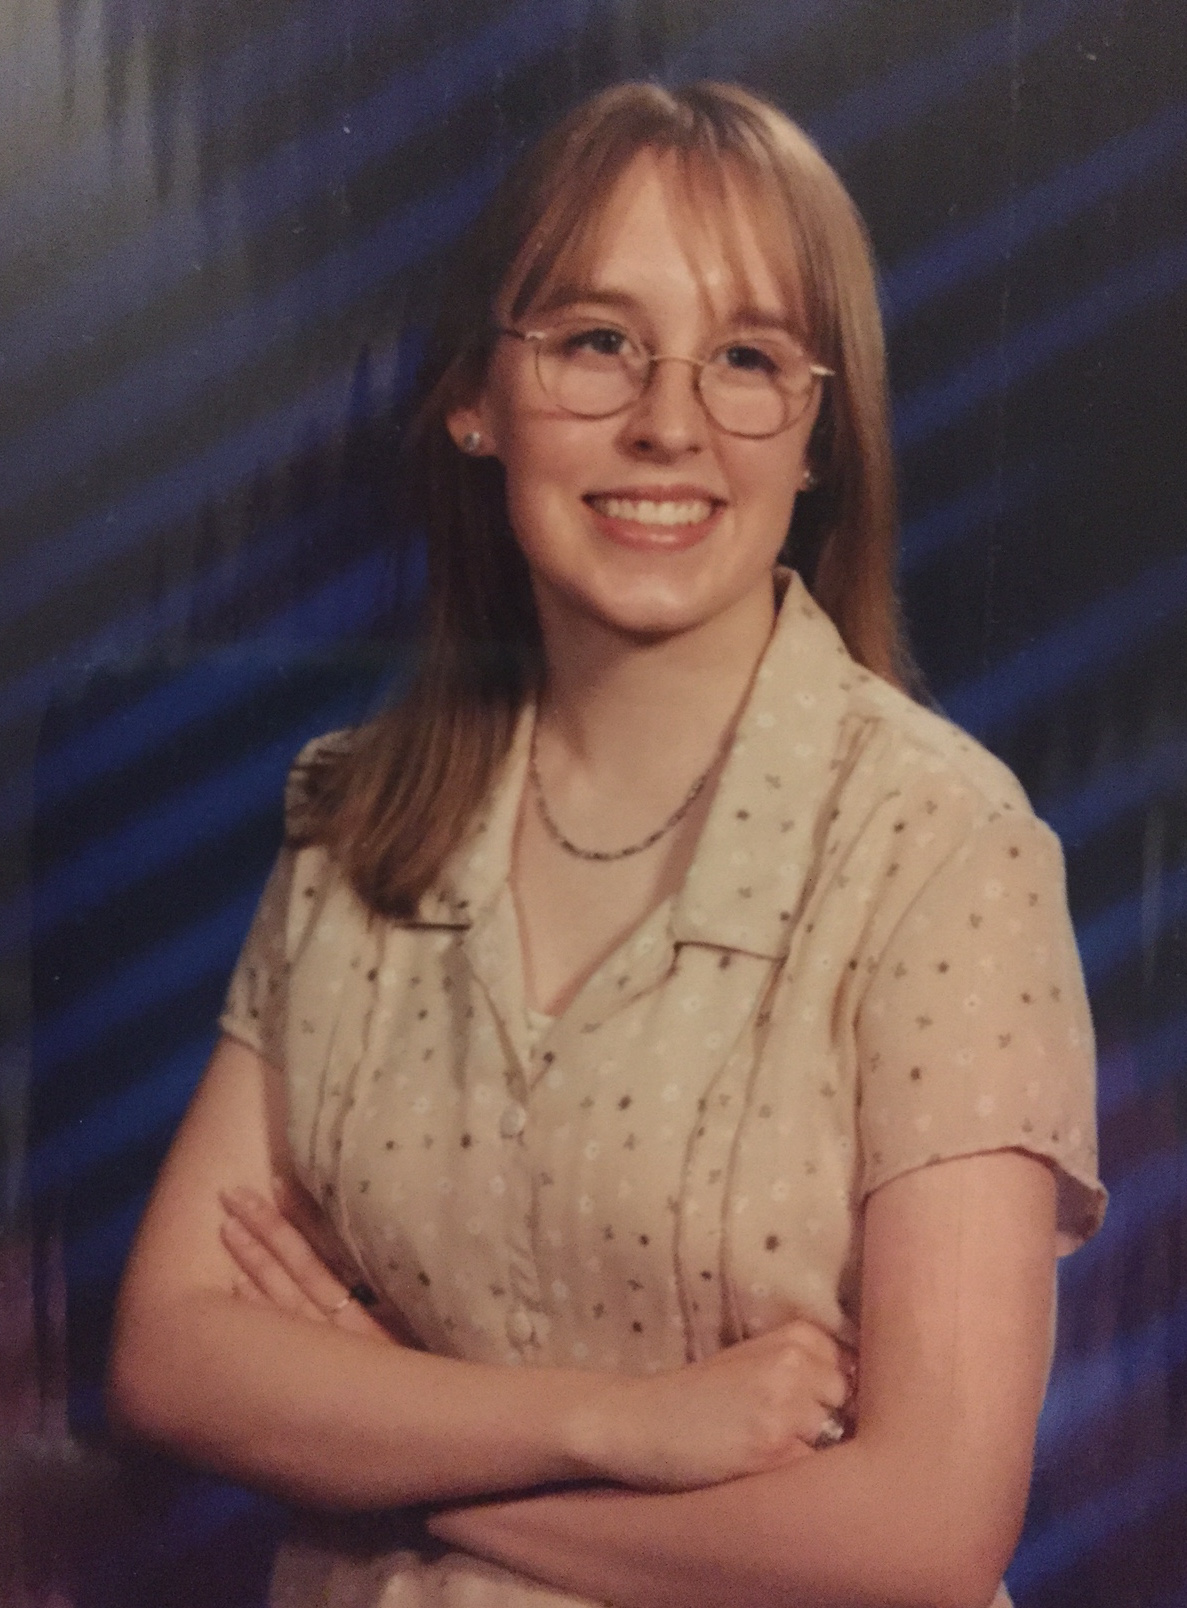 Brandi-Age 16